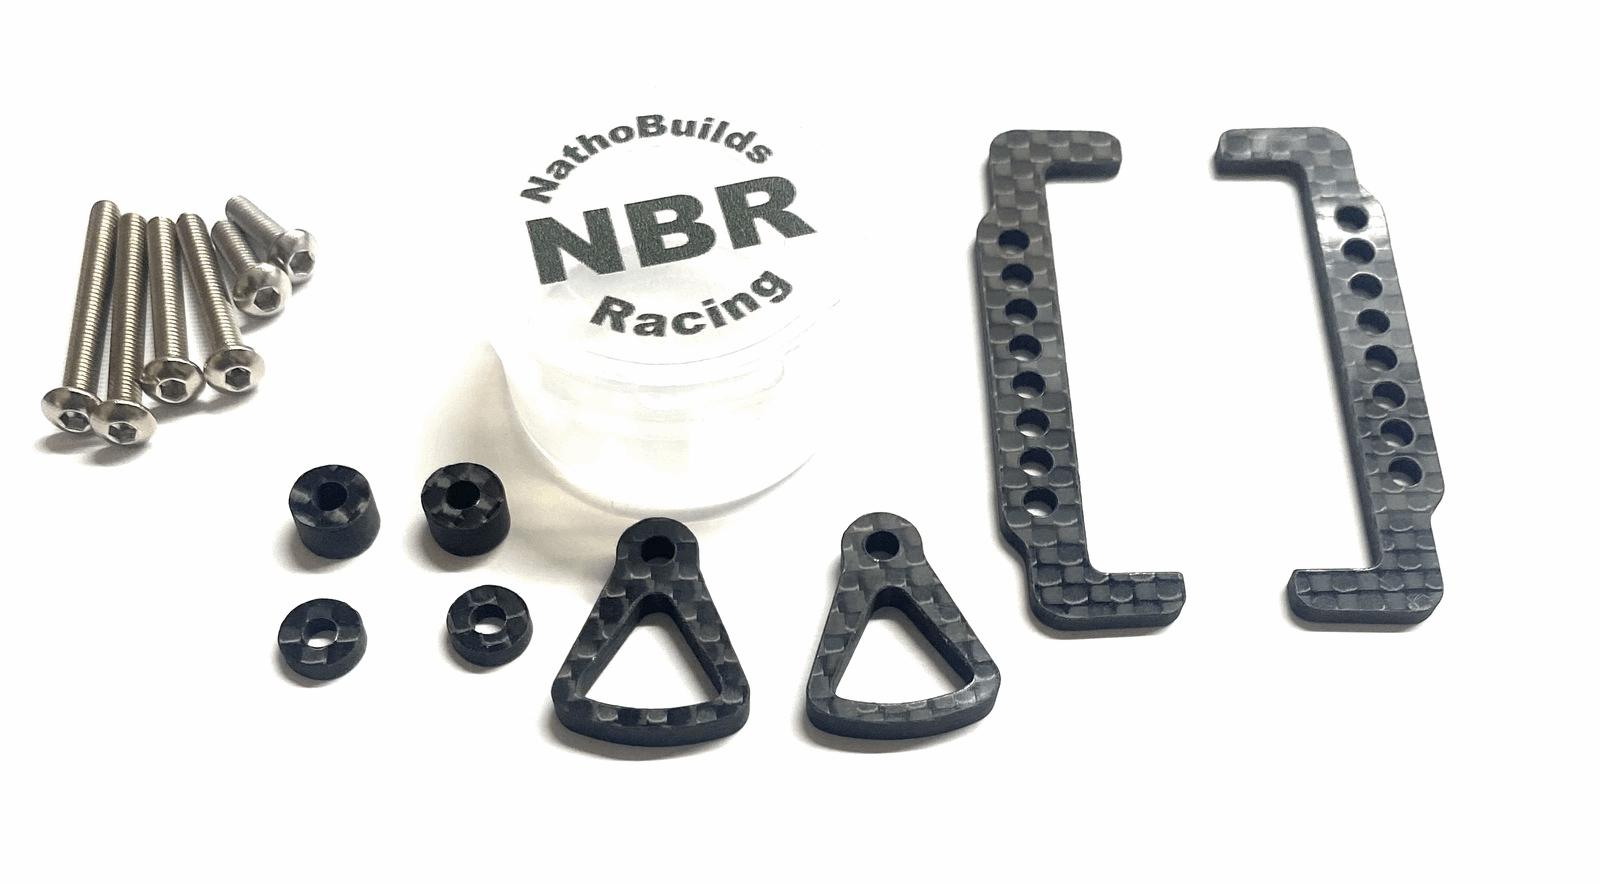 NathoBuilds Carbon Battery Strap X-Ray XB2 2020/2021